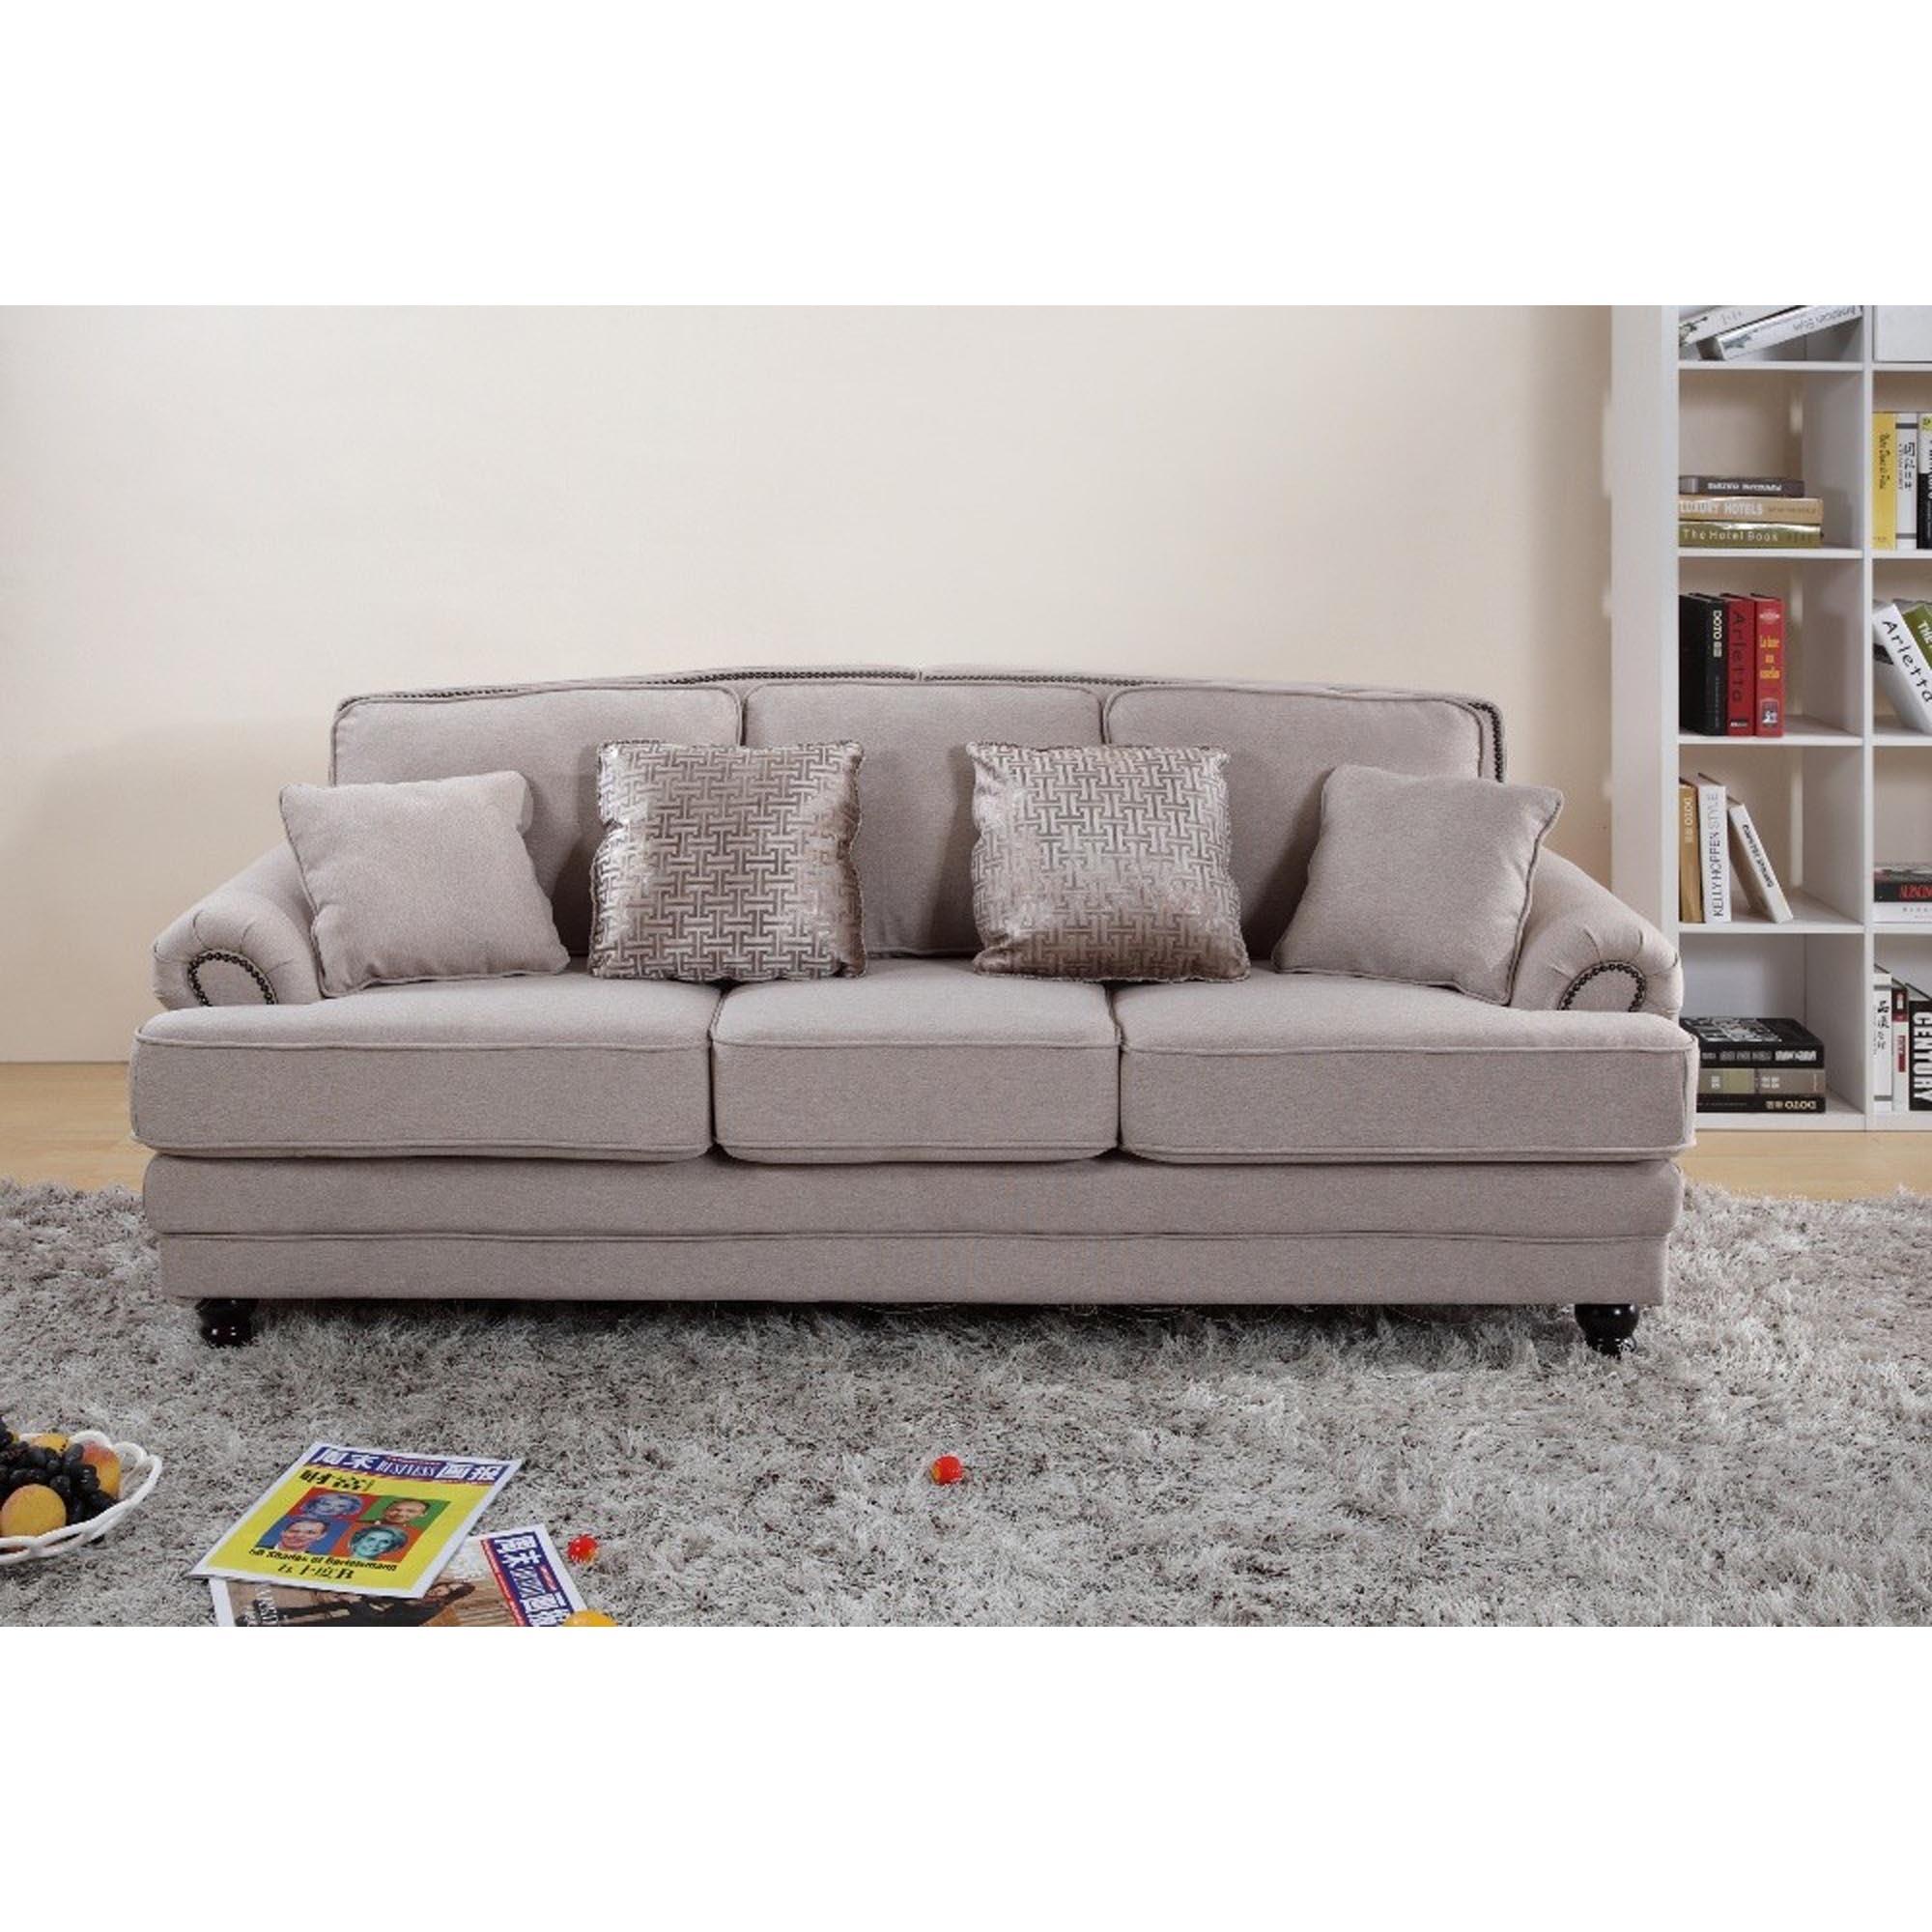 Nicole 3 Seater Beige Sofa